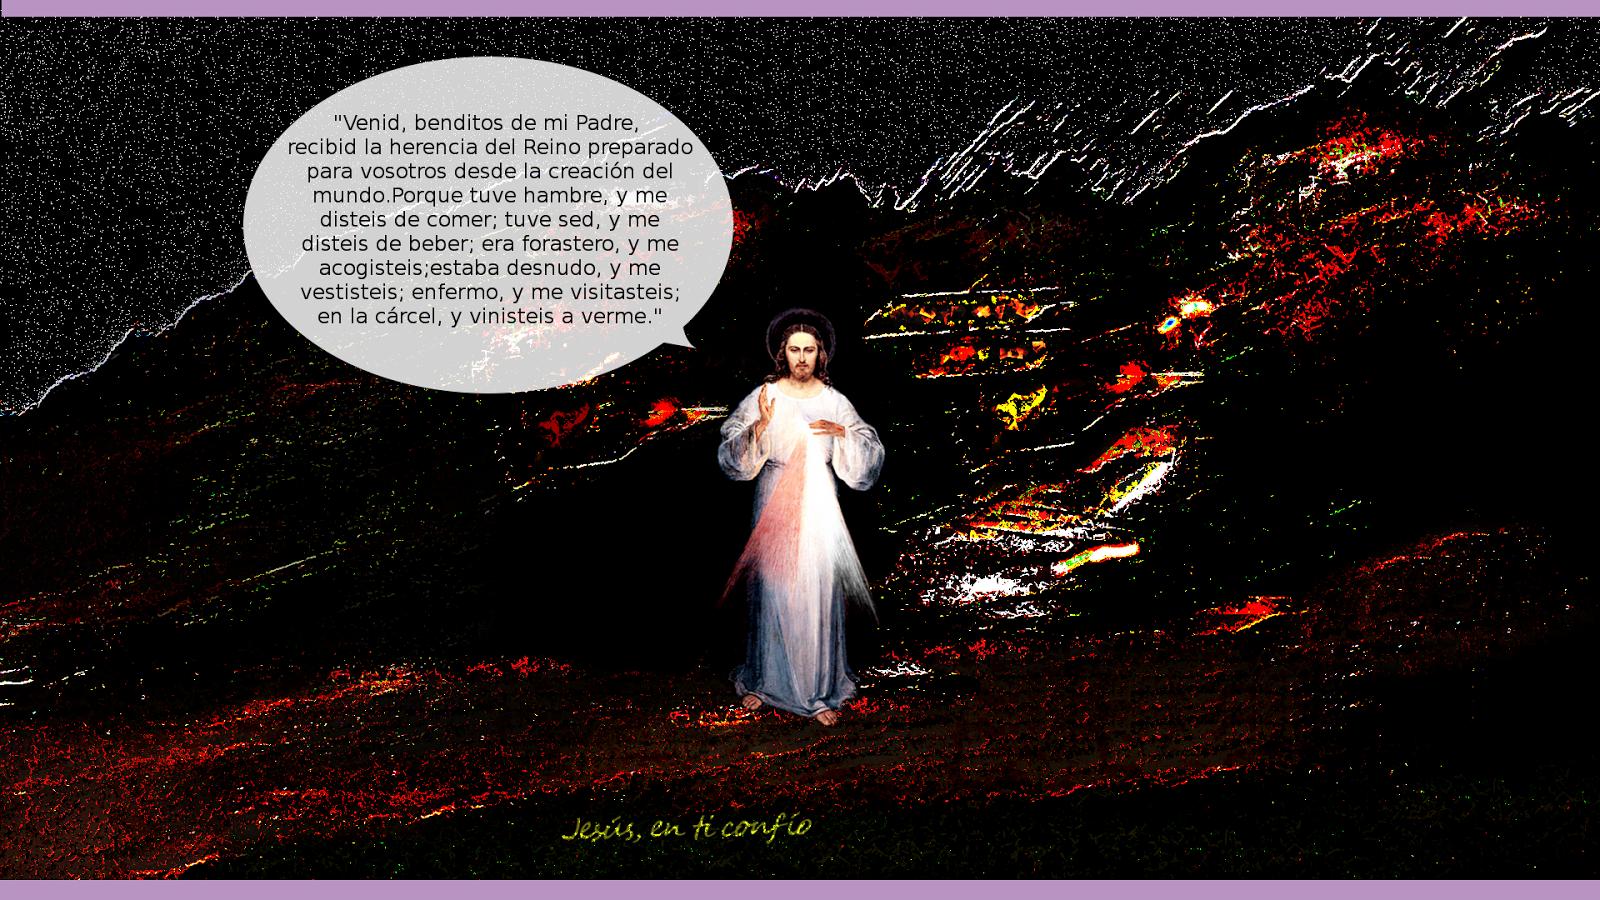 mensaje de la divina misericordia en cuaresma